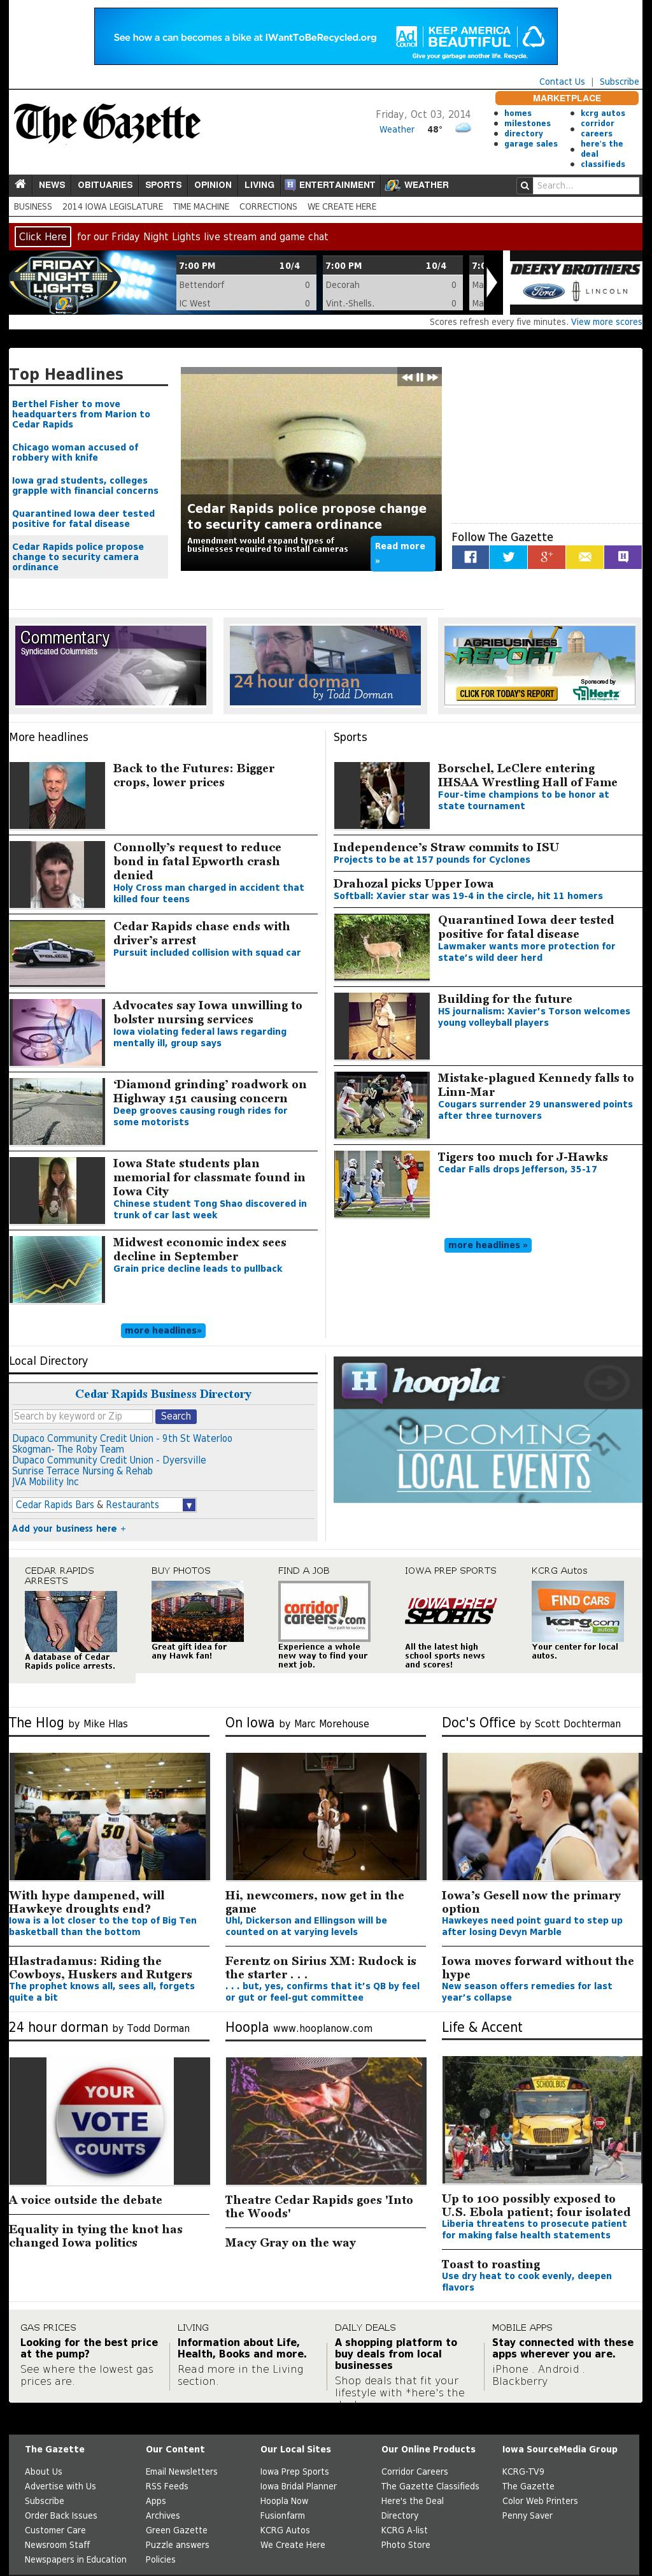 The (Cedar Rapids) Gazette at Friday Oct. 3, 2014, 8:06 p.m. UTC